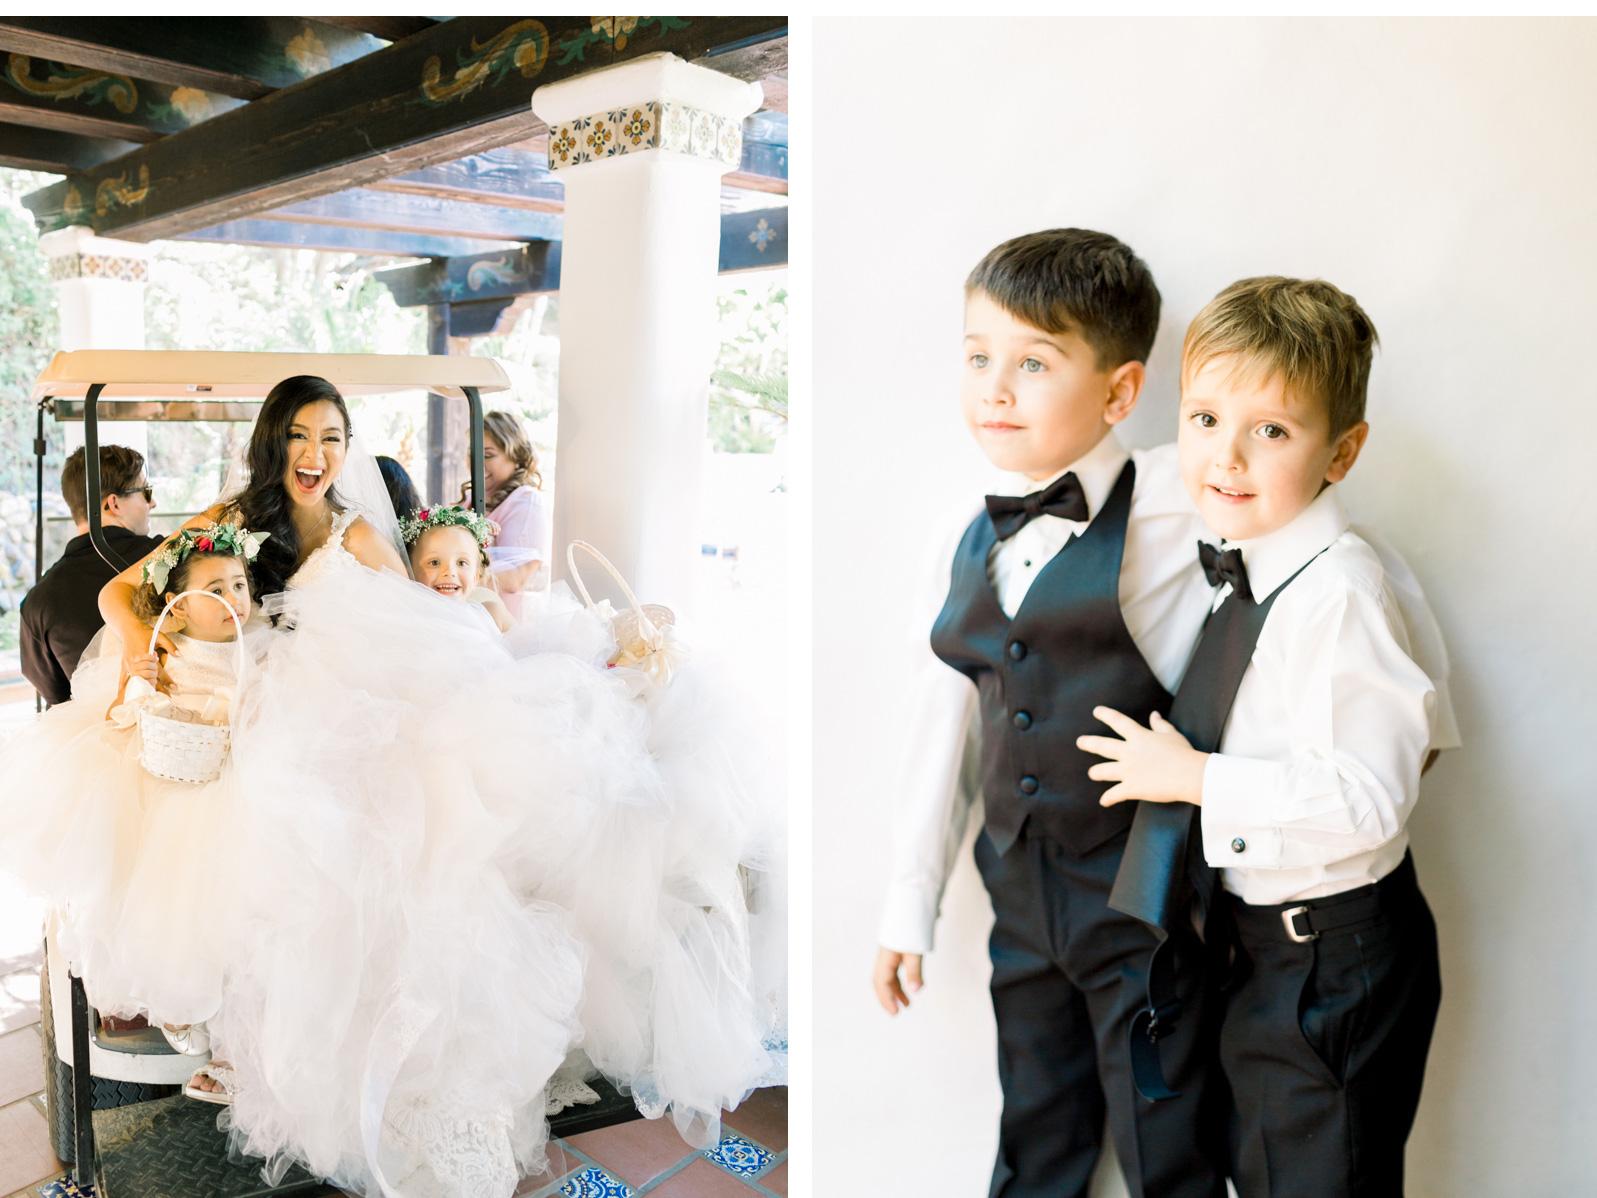 Floral-Arch-Wedding-Natalie-Schutt-Photography_10.jpg